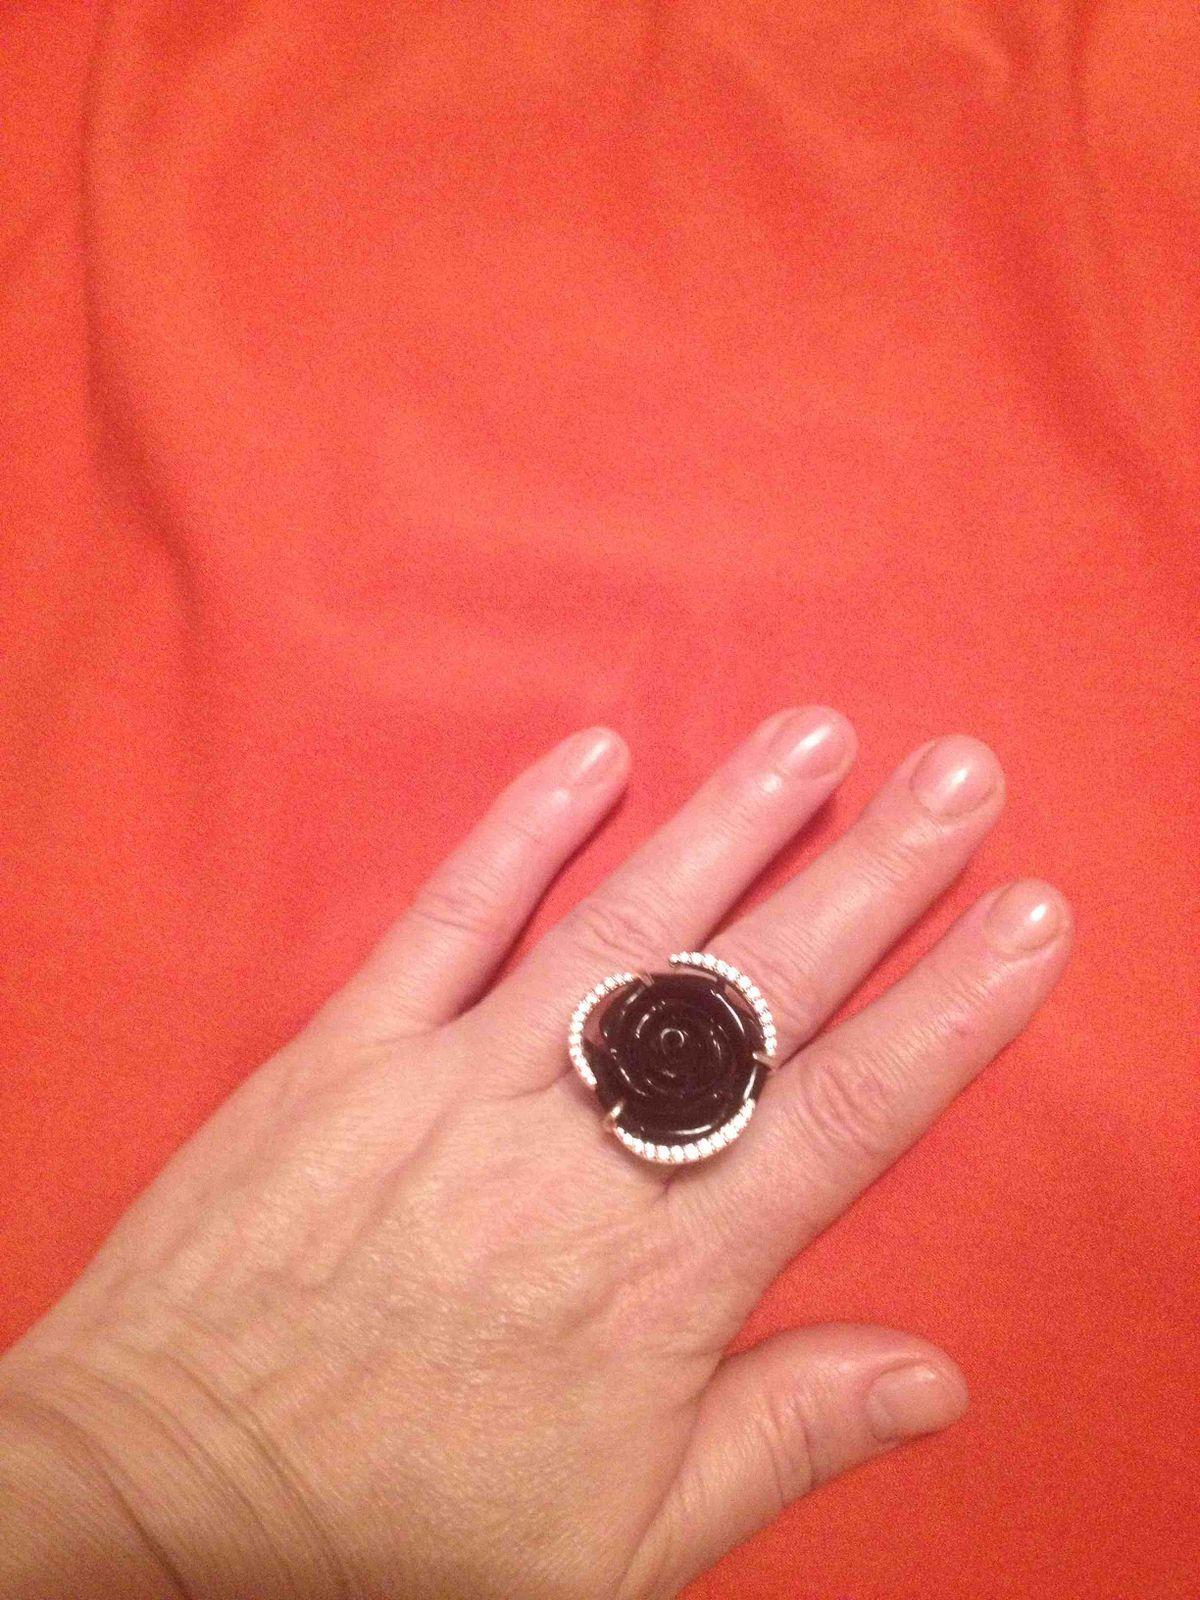 Кольцо просто супер, за свою цену выглядит дороже